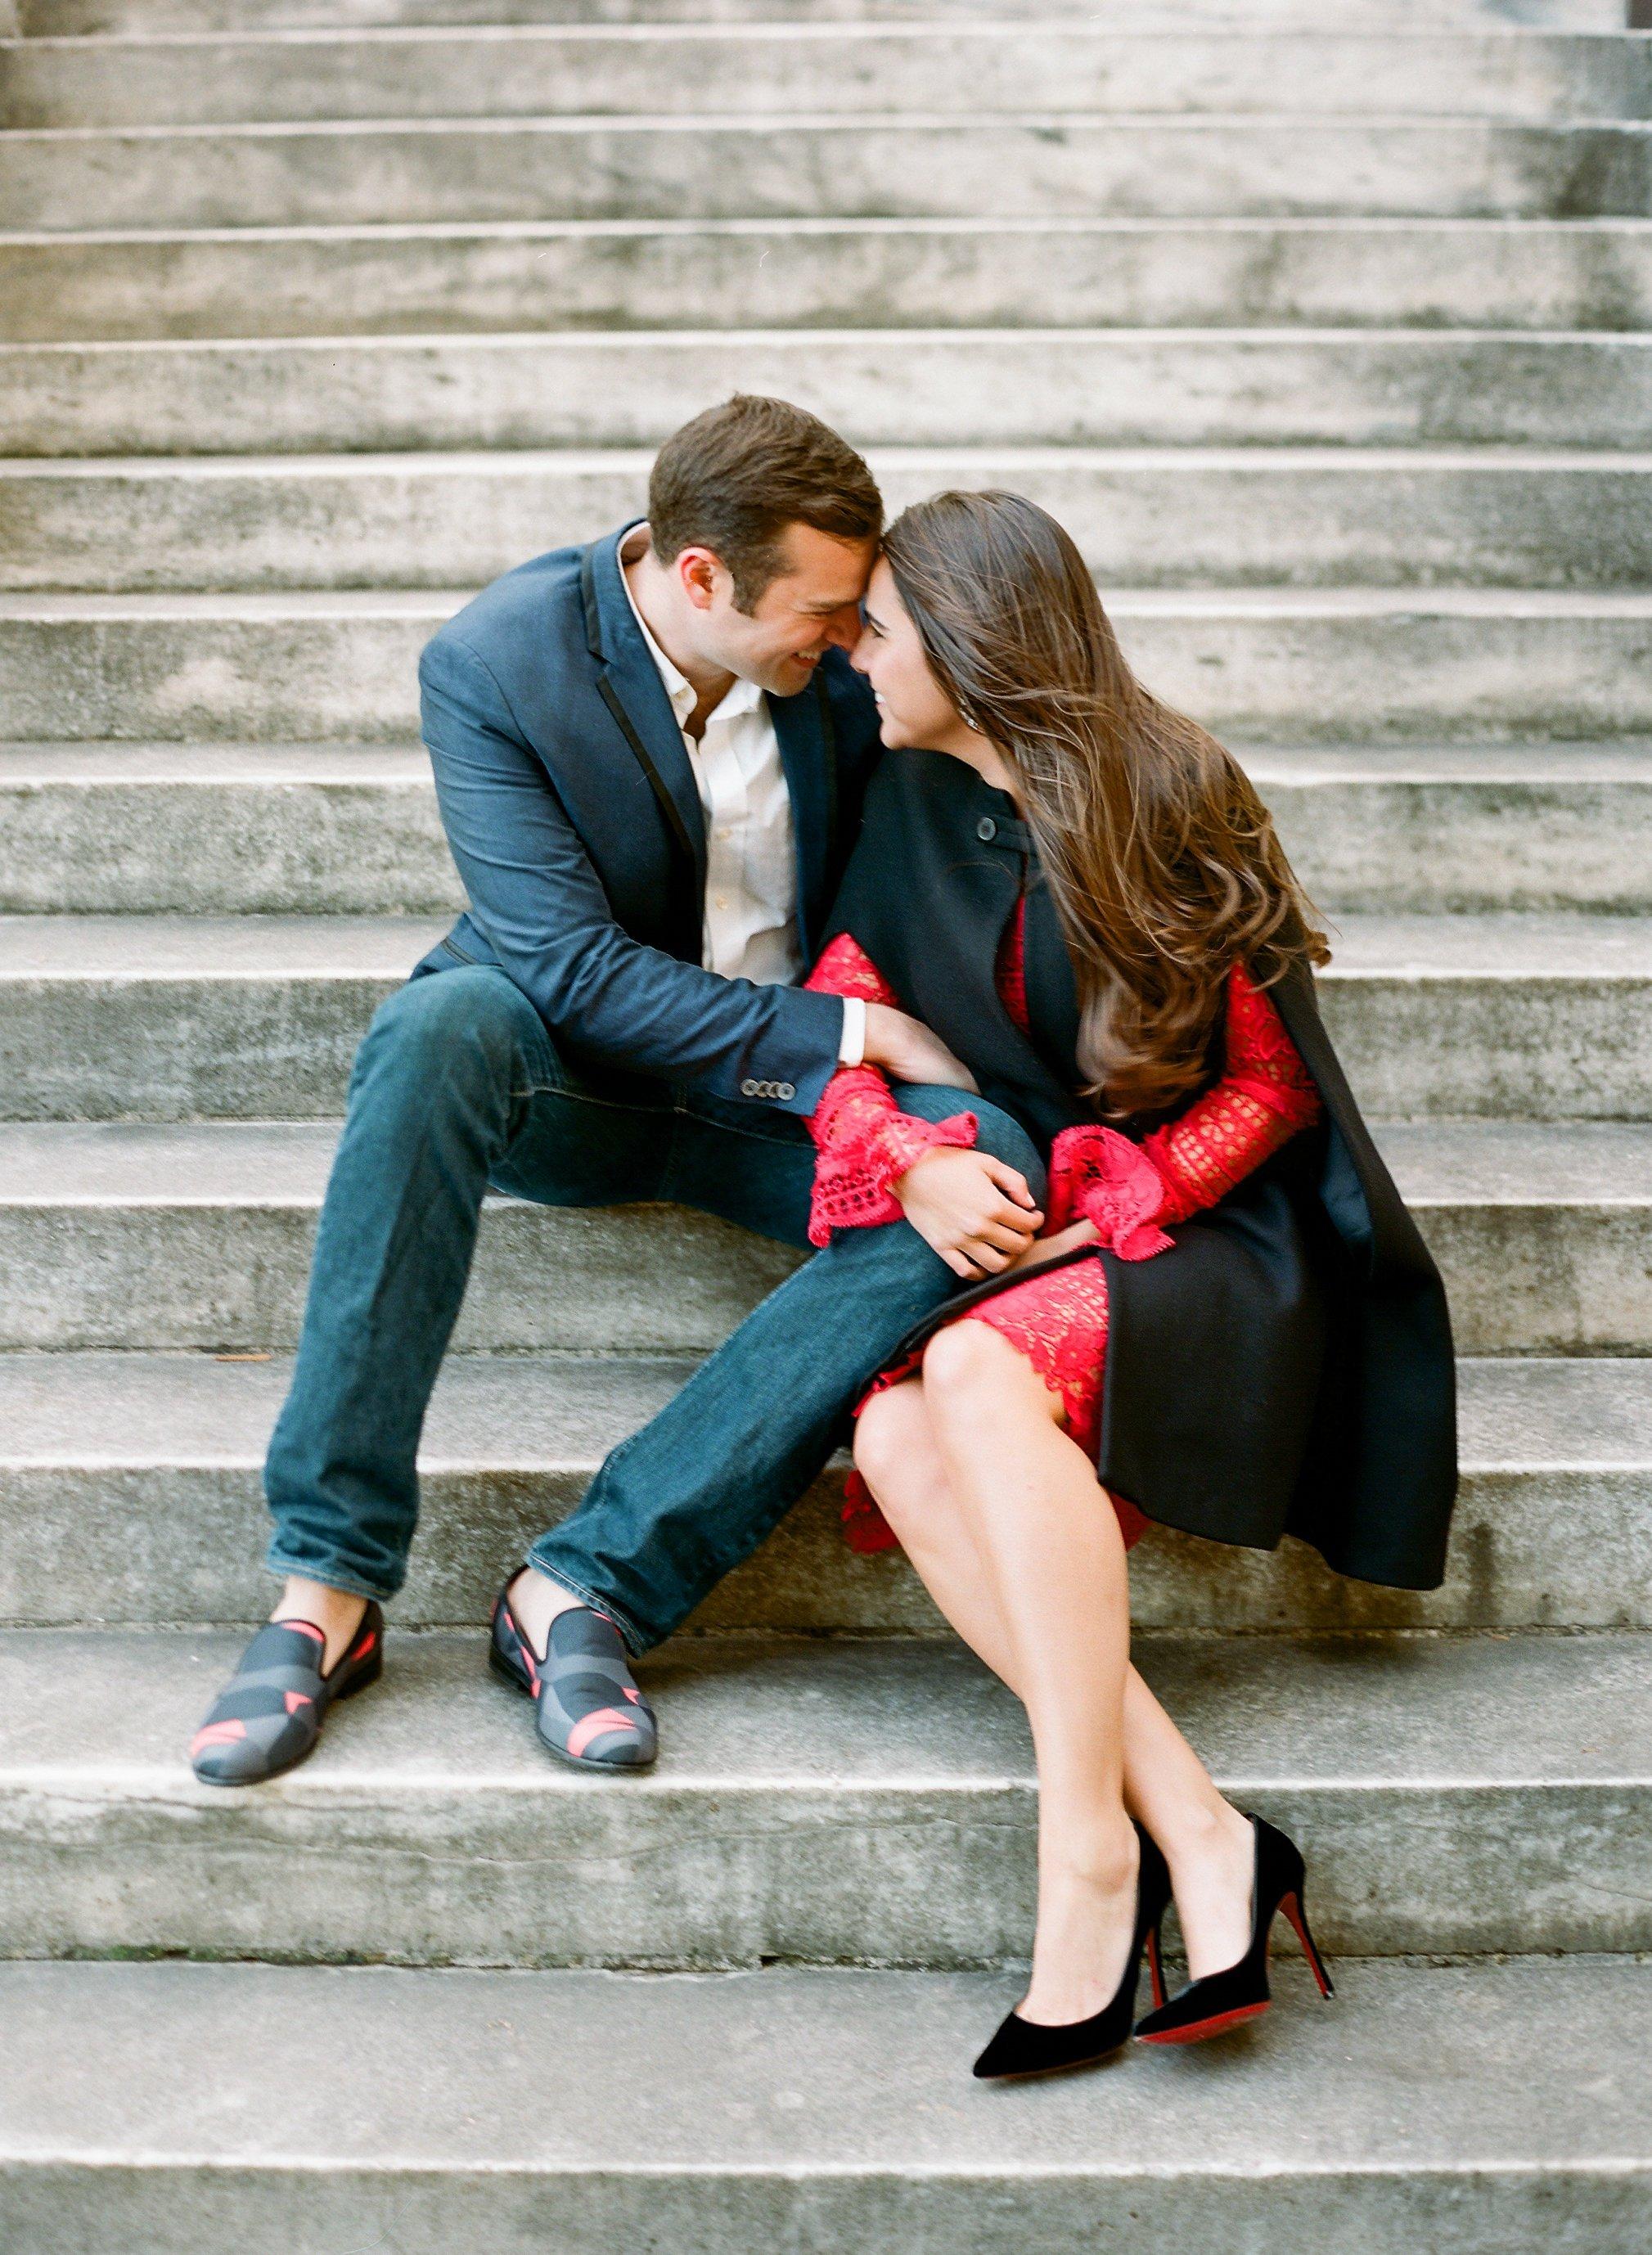 2020 Louboutin Couple